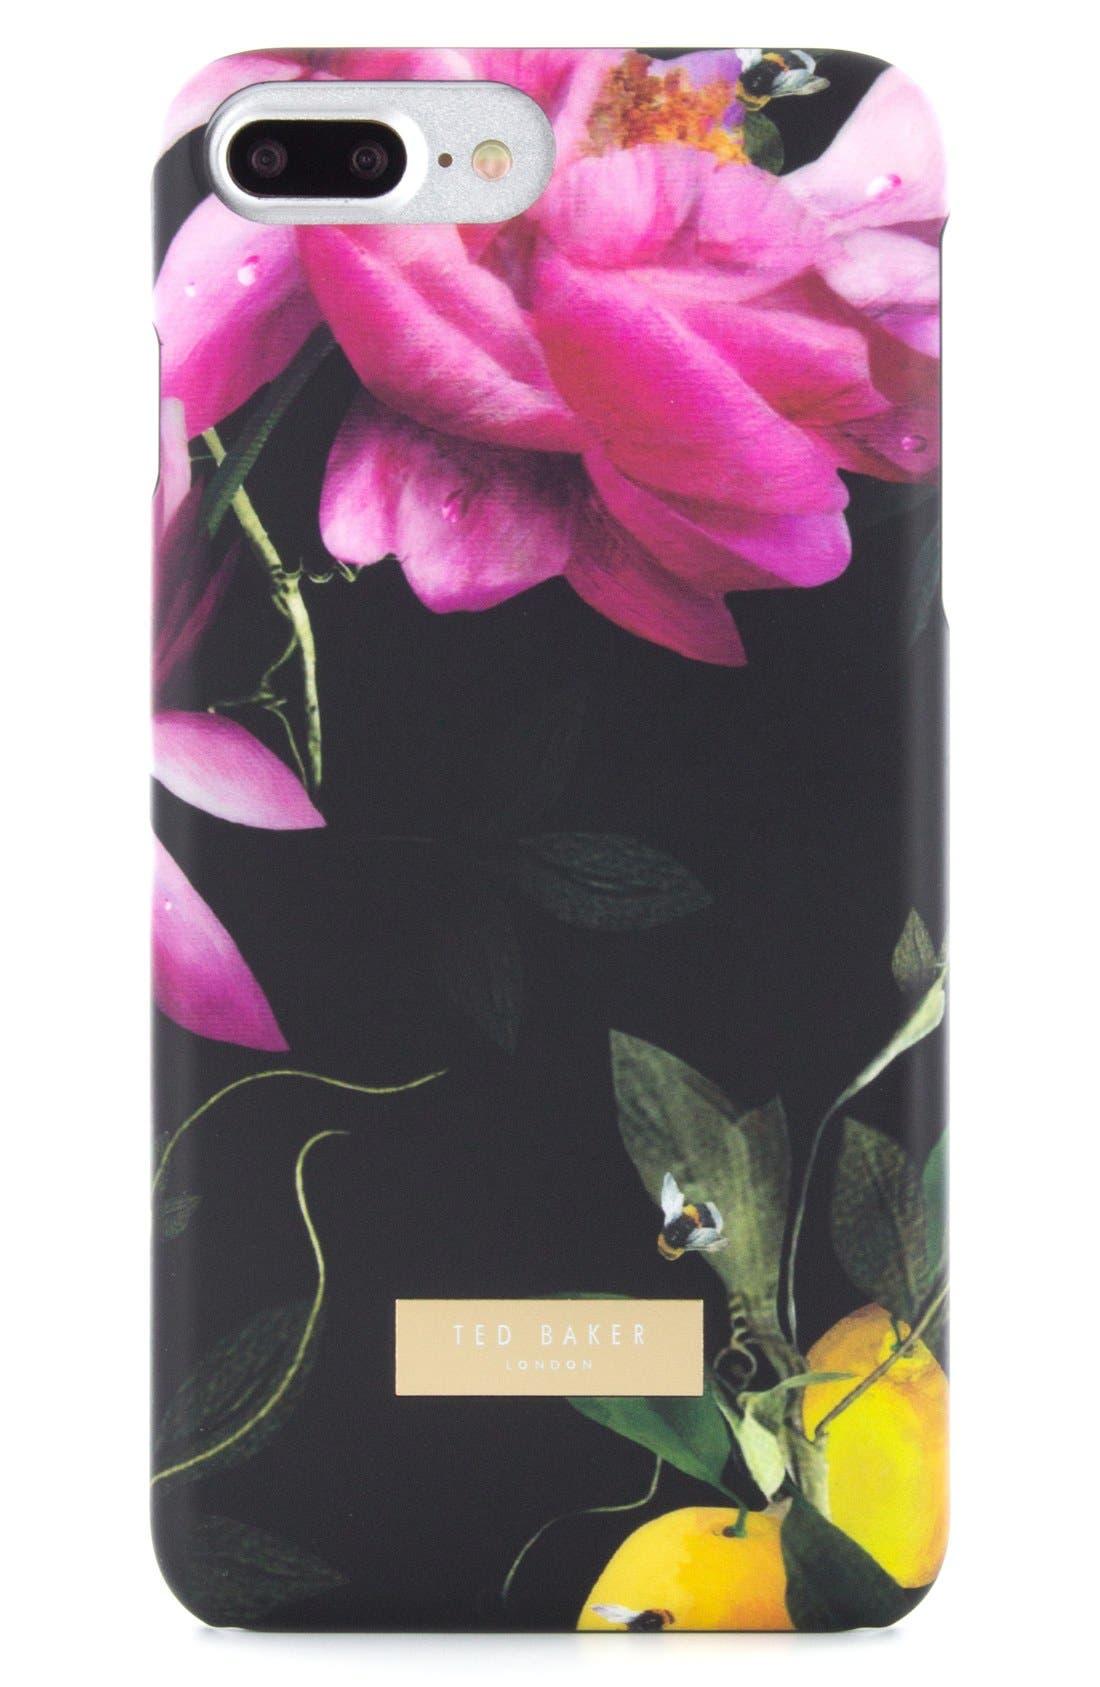 Ted Baker London Citrus Bloom iPhone 6/6s/7/8 & 6/7/8 Plus CaseCase